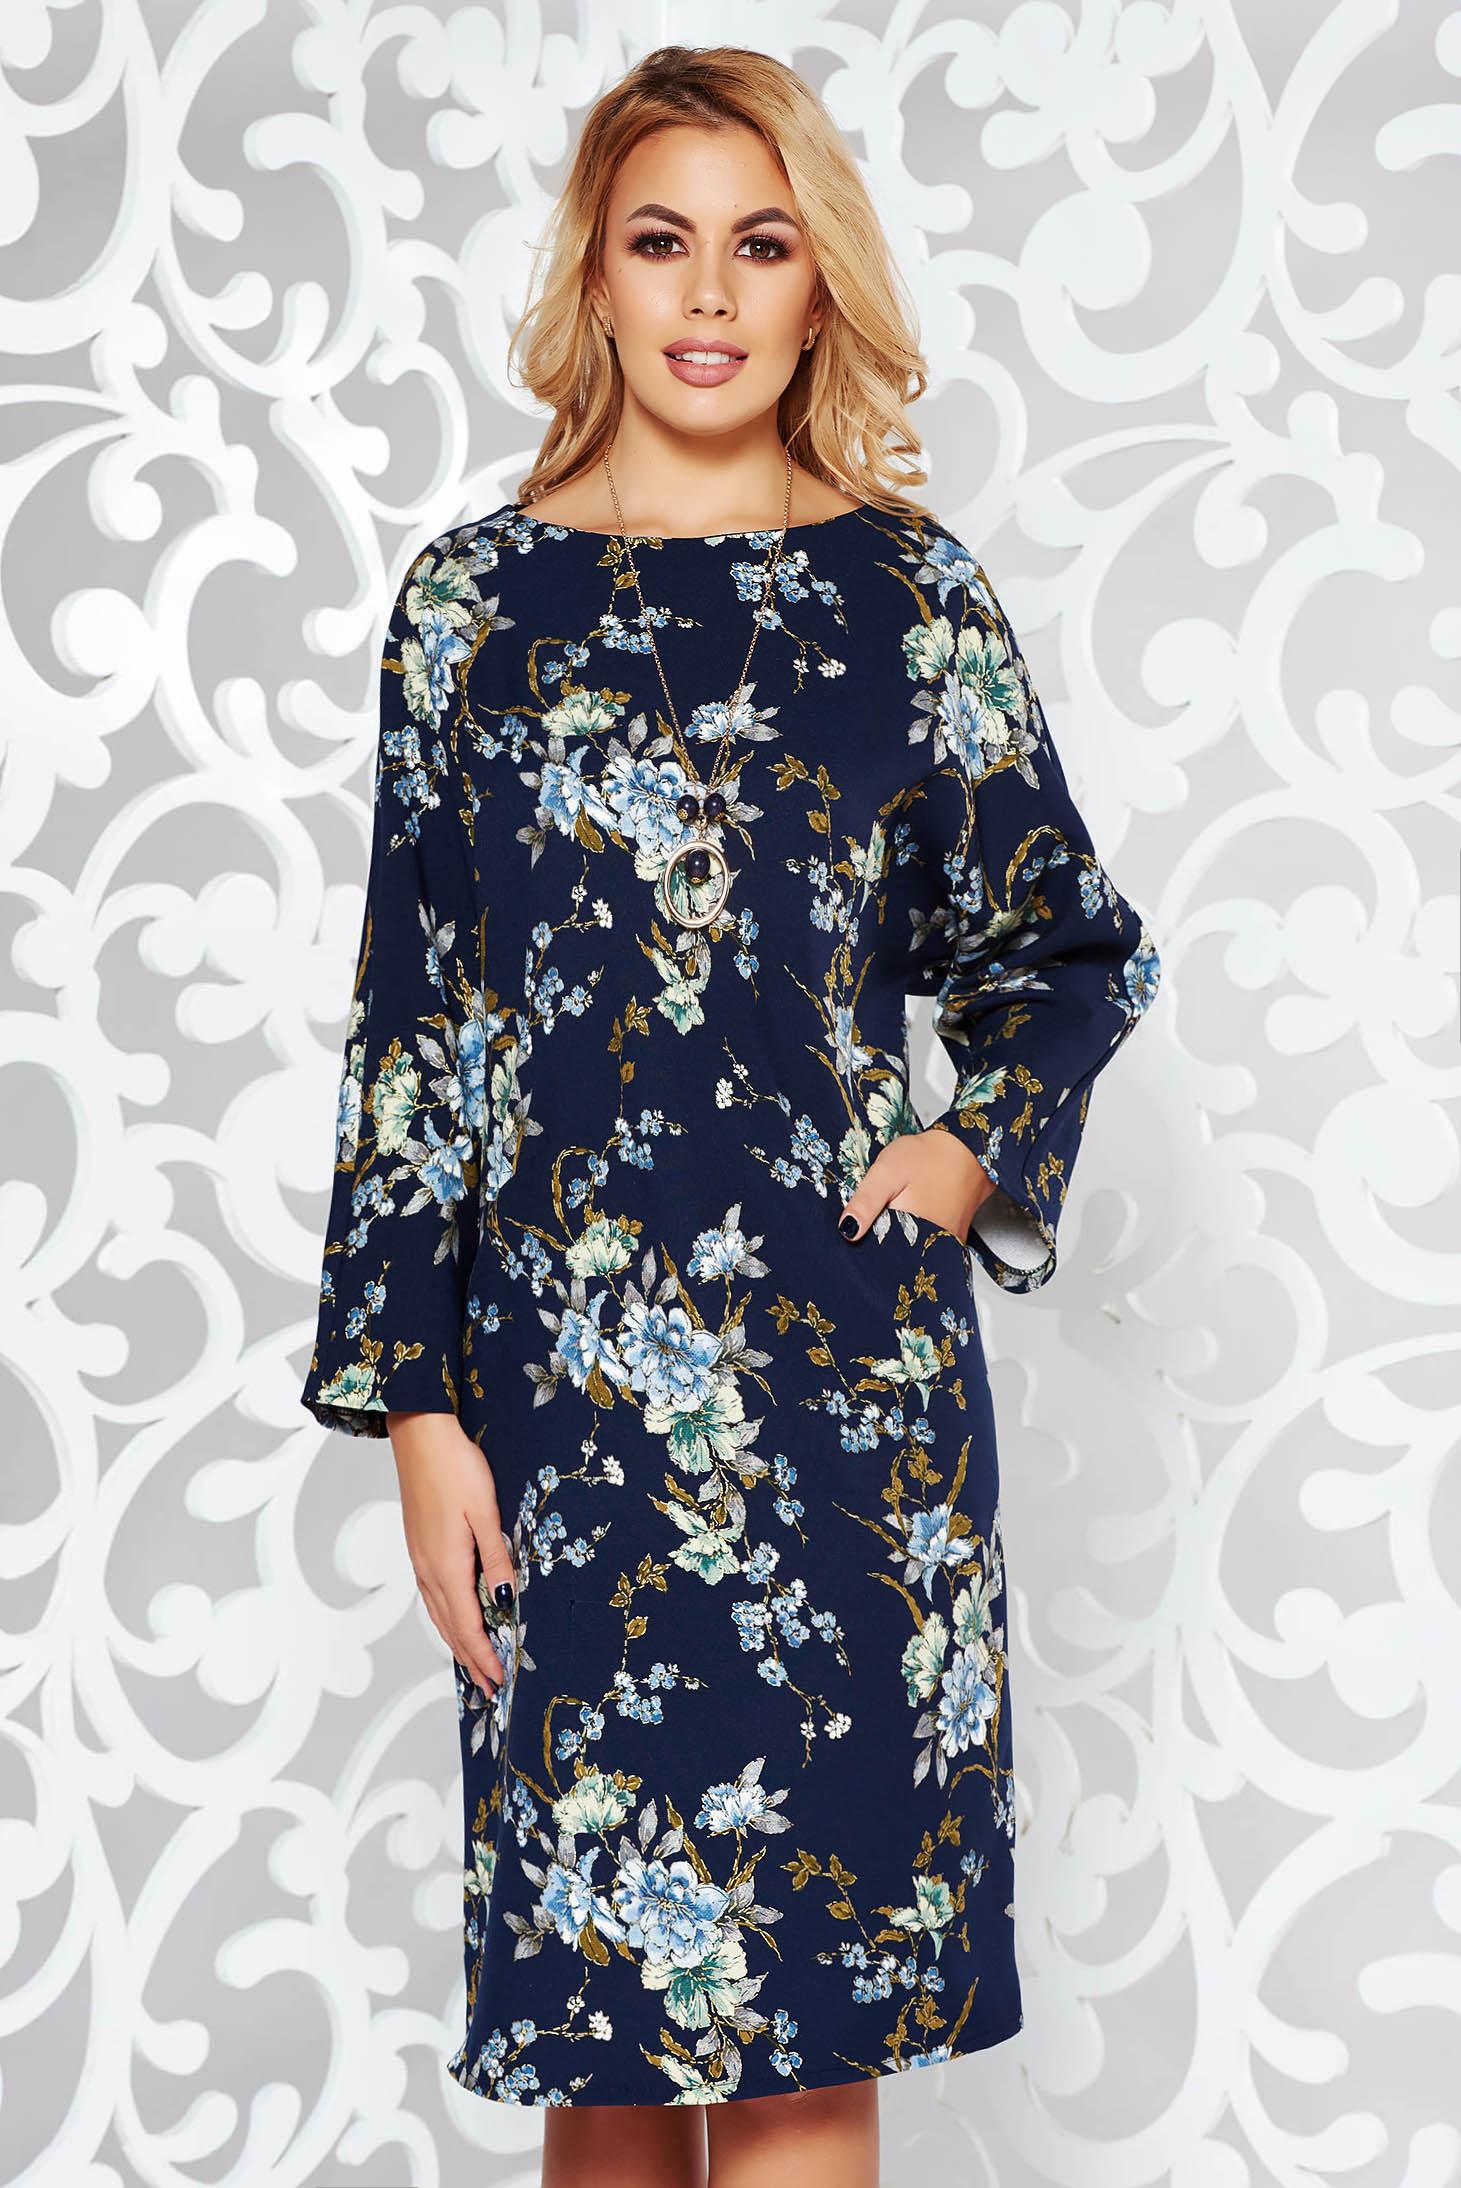 Darkblue elegant flared dress slightly elastic fabric accessorized with chain